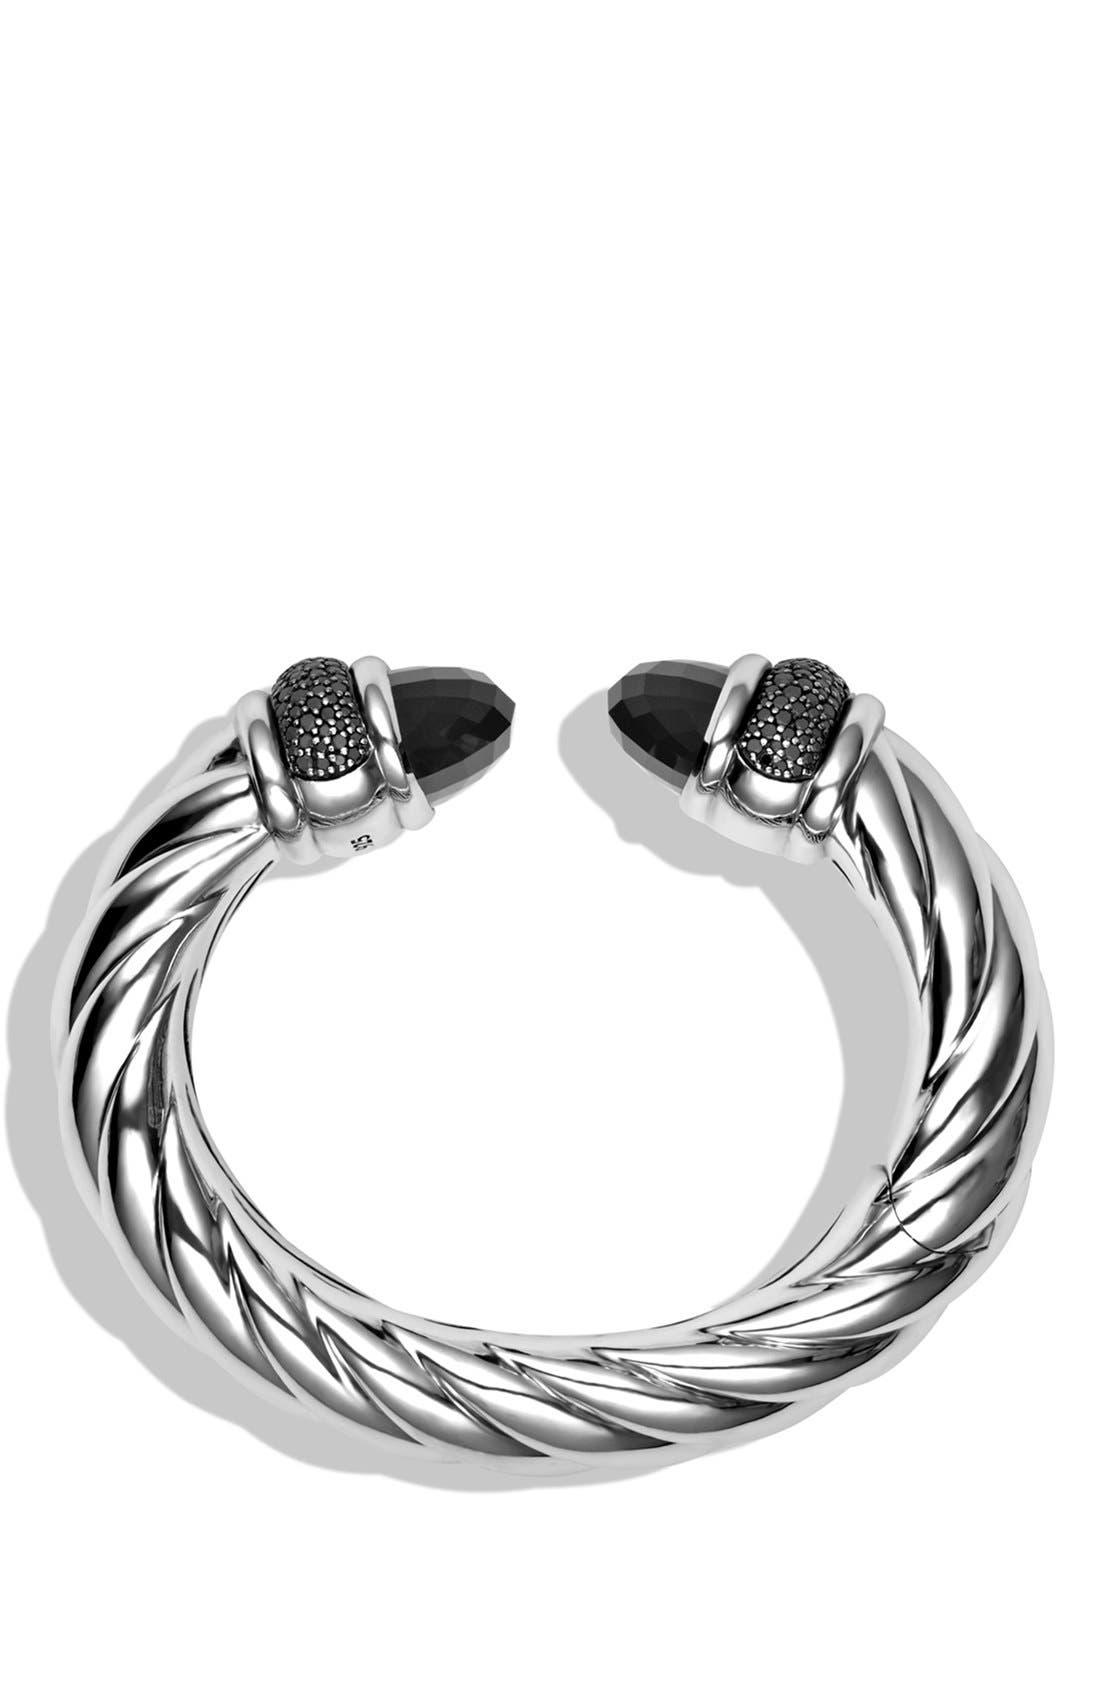 Alternate Image 2  - David Yurman 'Waverly' Bracelet